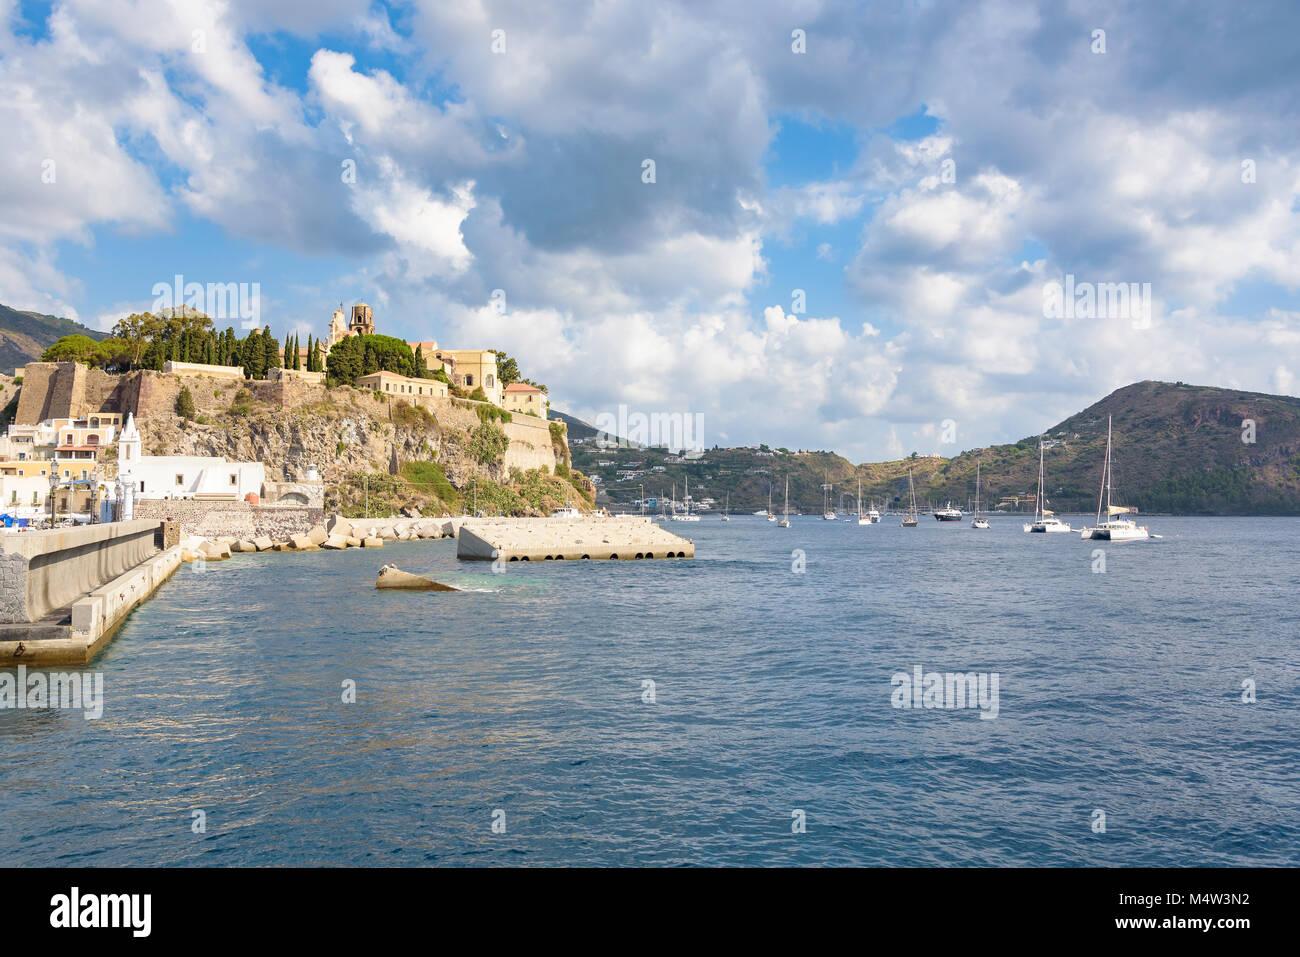 View of the Castle rock on Lipari Island, Aeolian Islands, Italy Stock Photo